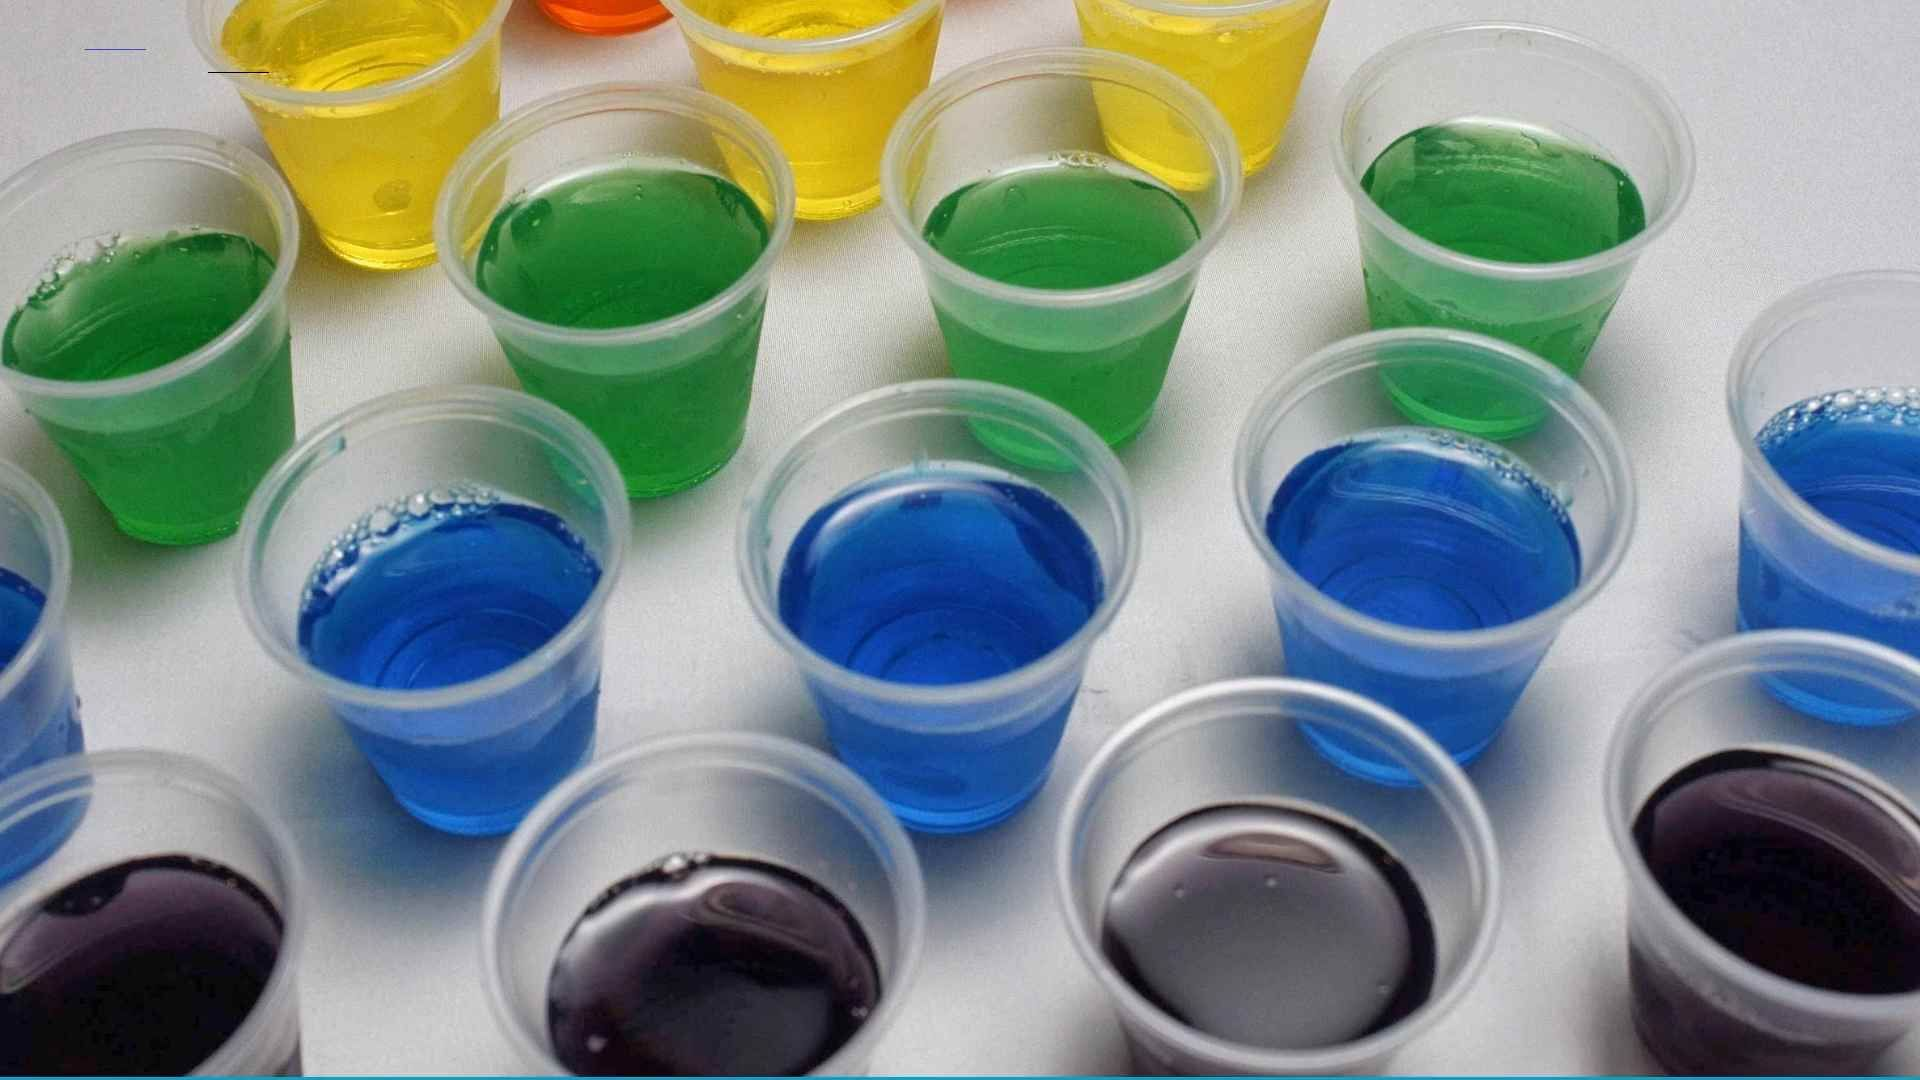 How to make jello shots with vodka jelloshotrecipes in